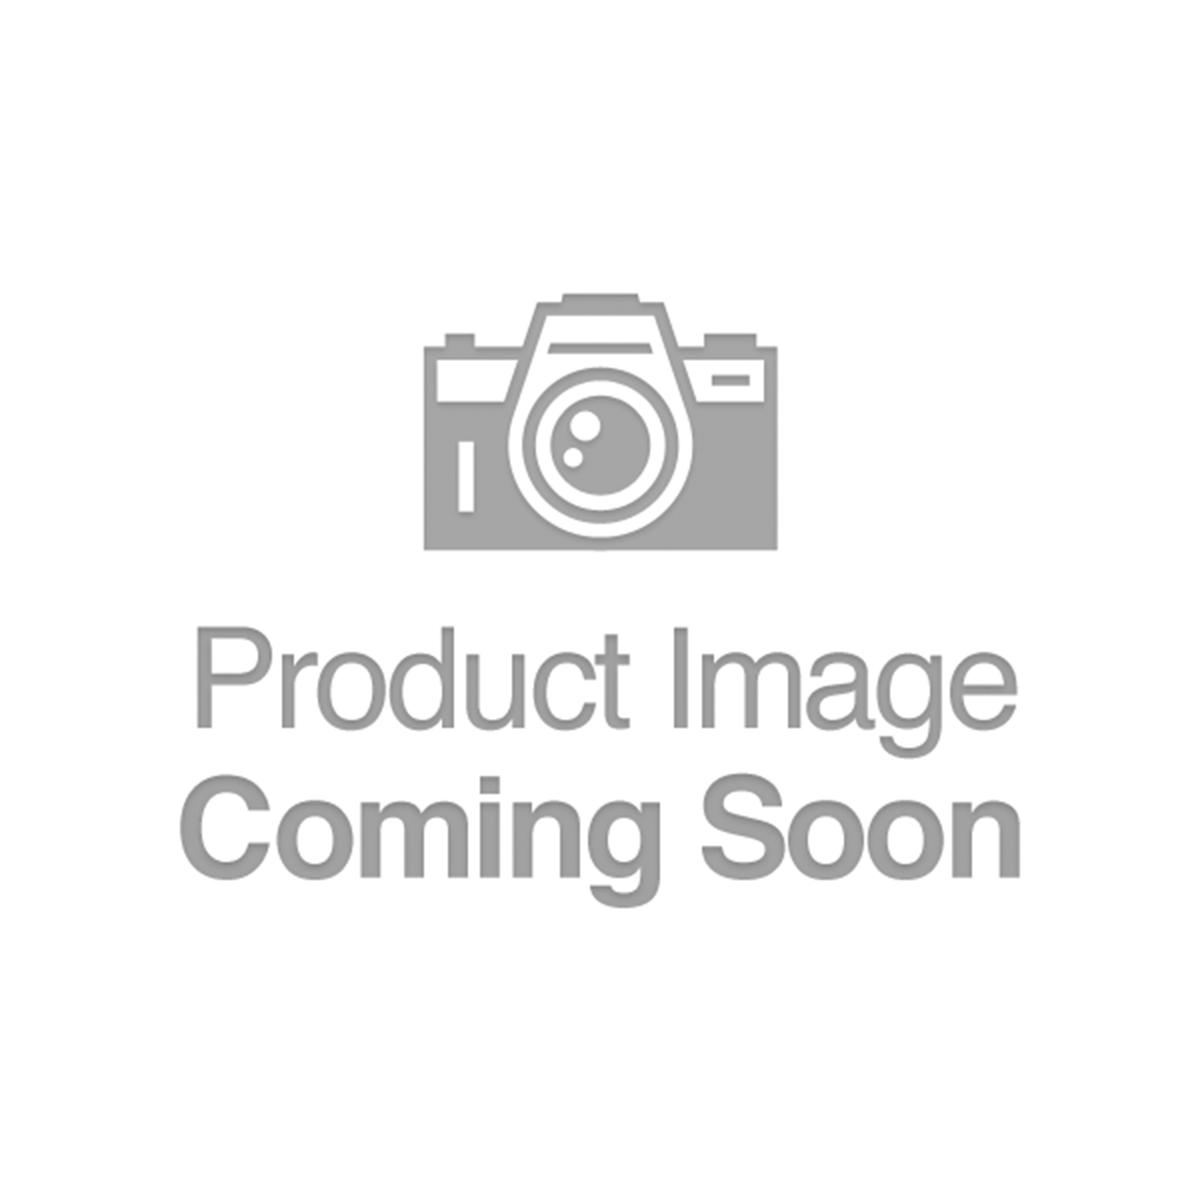 Deadwood - South Dakota - CH 2391 - FR 1802-1 - PMG 30